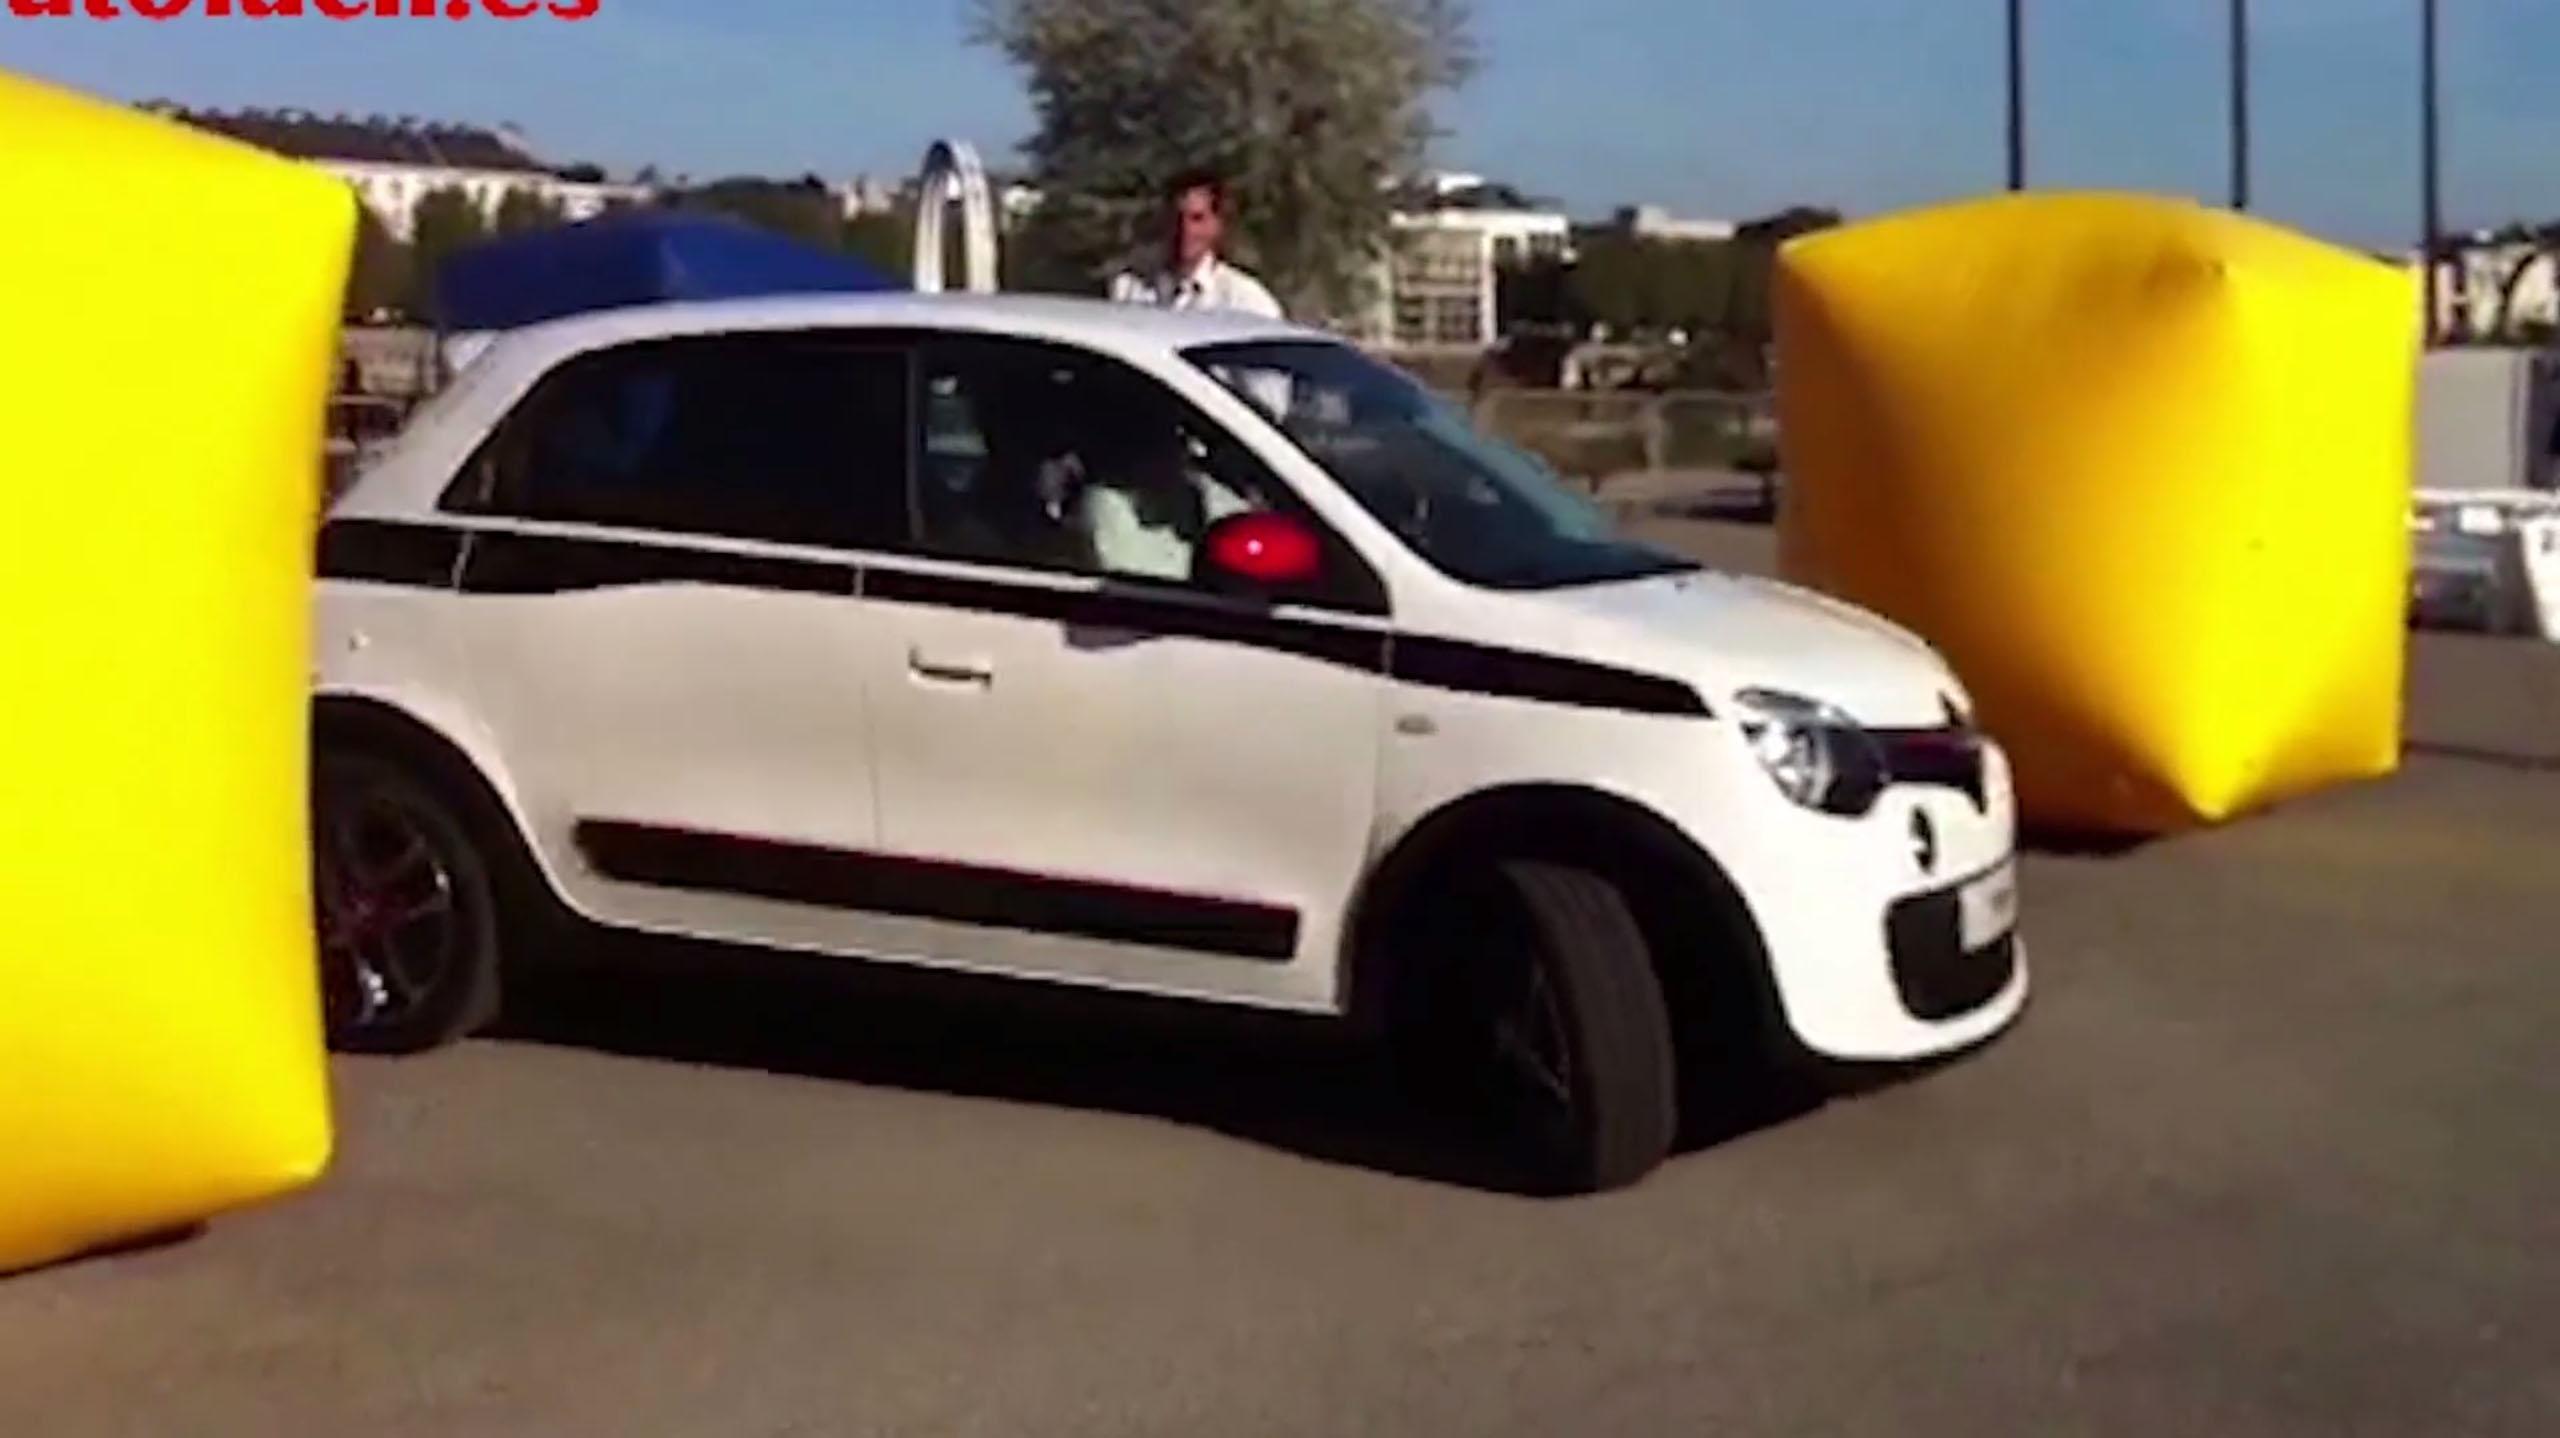 Renault Twingo: ¿Por qué gira tanto?